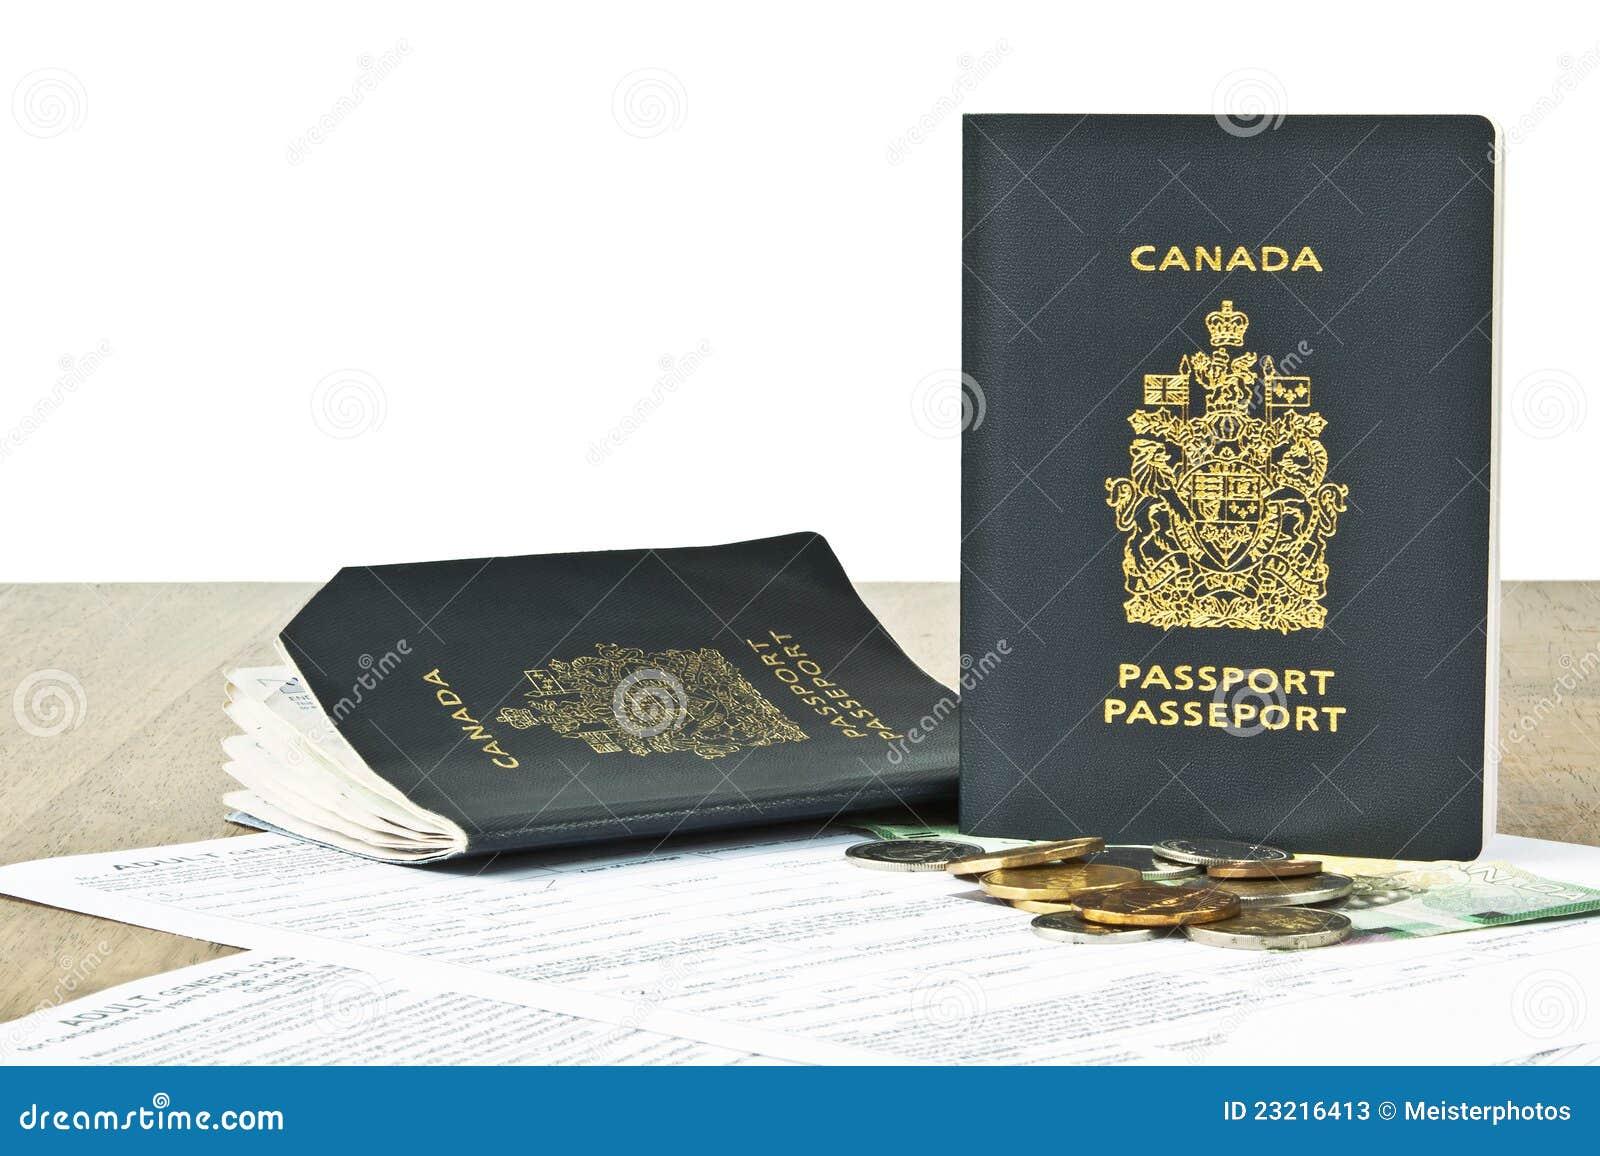 Passport renewal form geminifm passport renewal form falaconquin